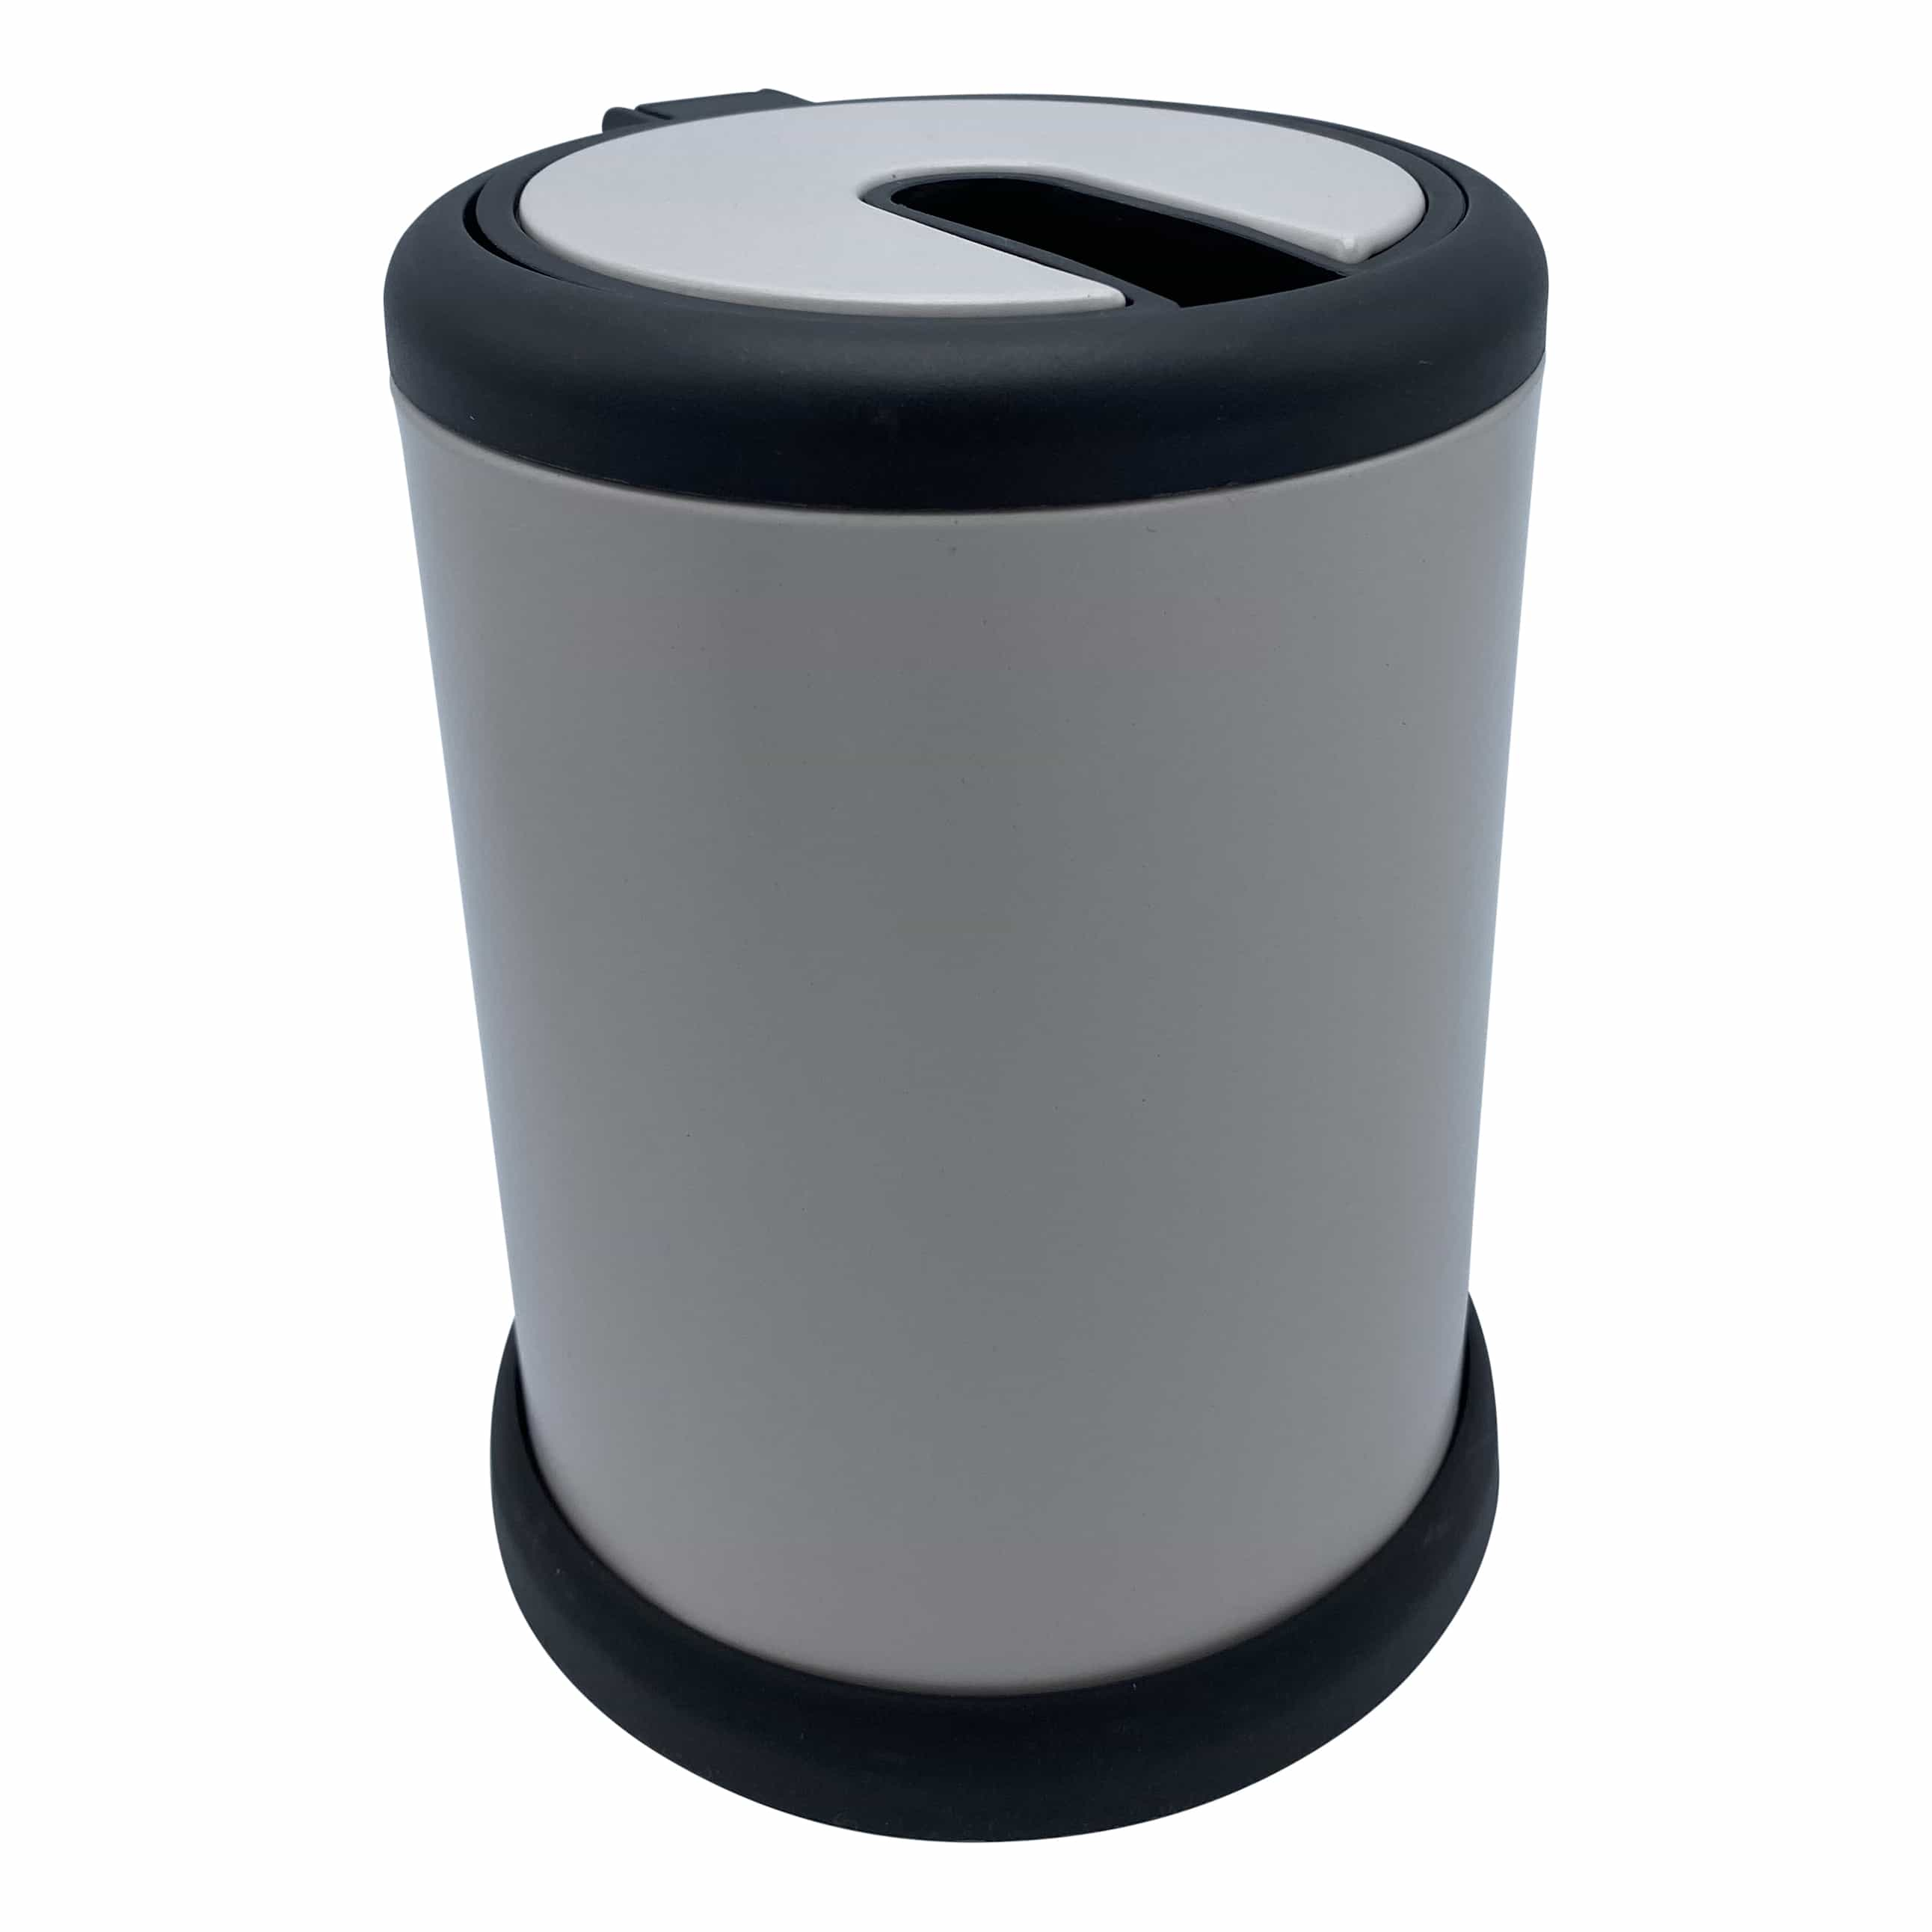 4goodz toiletborstel met klep - 11,5x39 cm - Mat Taupe